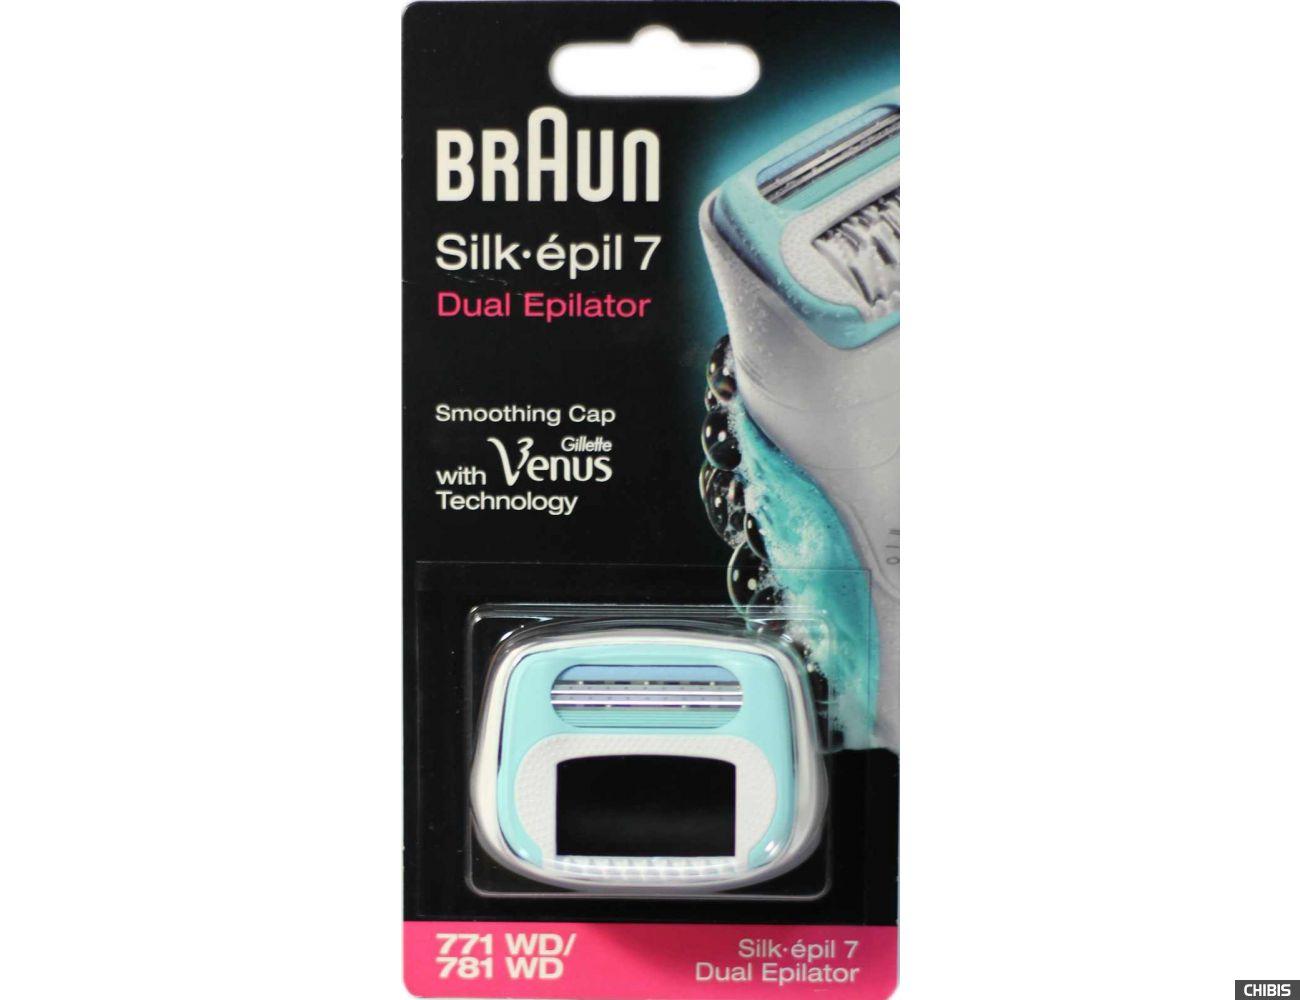 Насадка для эпилятора Braun 771 WD / 781 WD серии Silk epil 7 и Dual Epilator